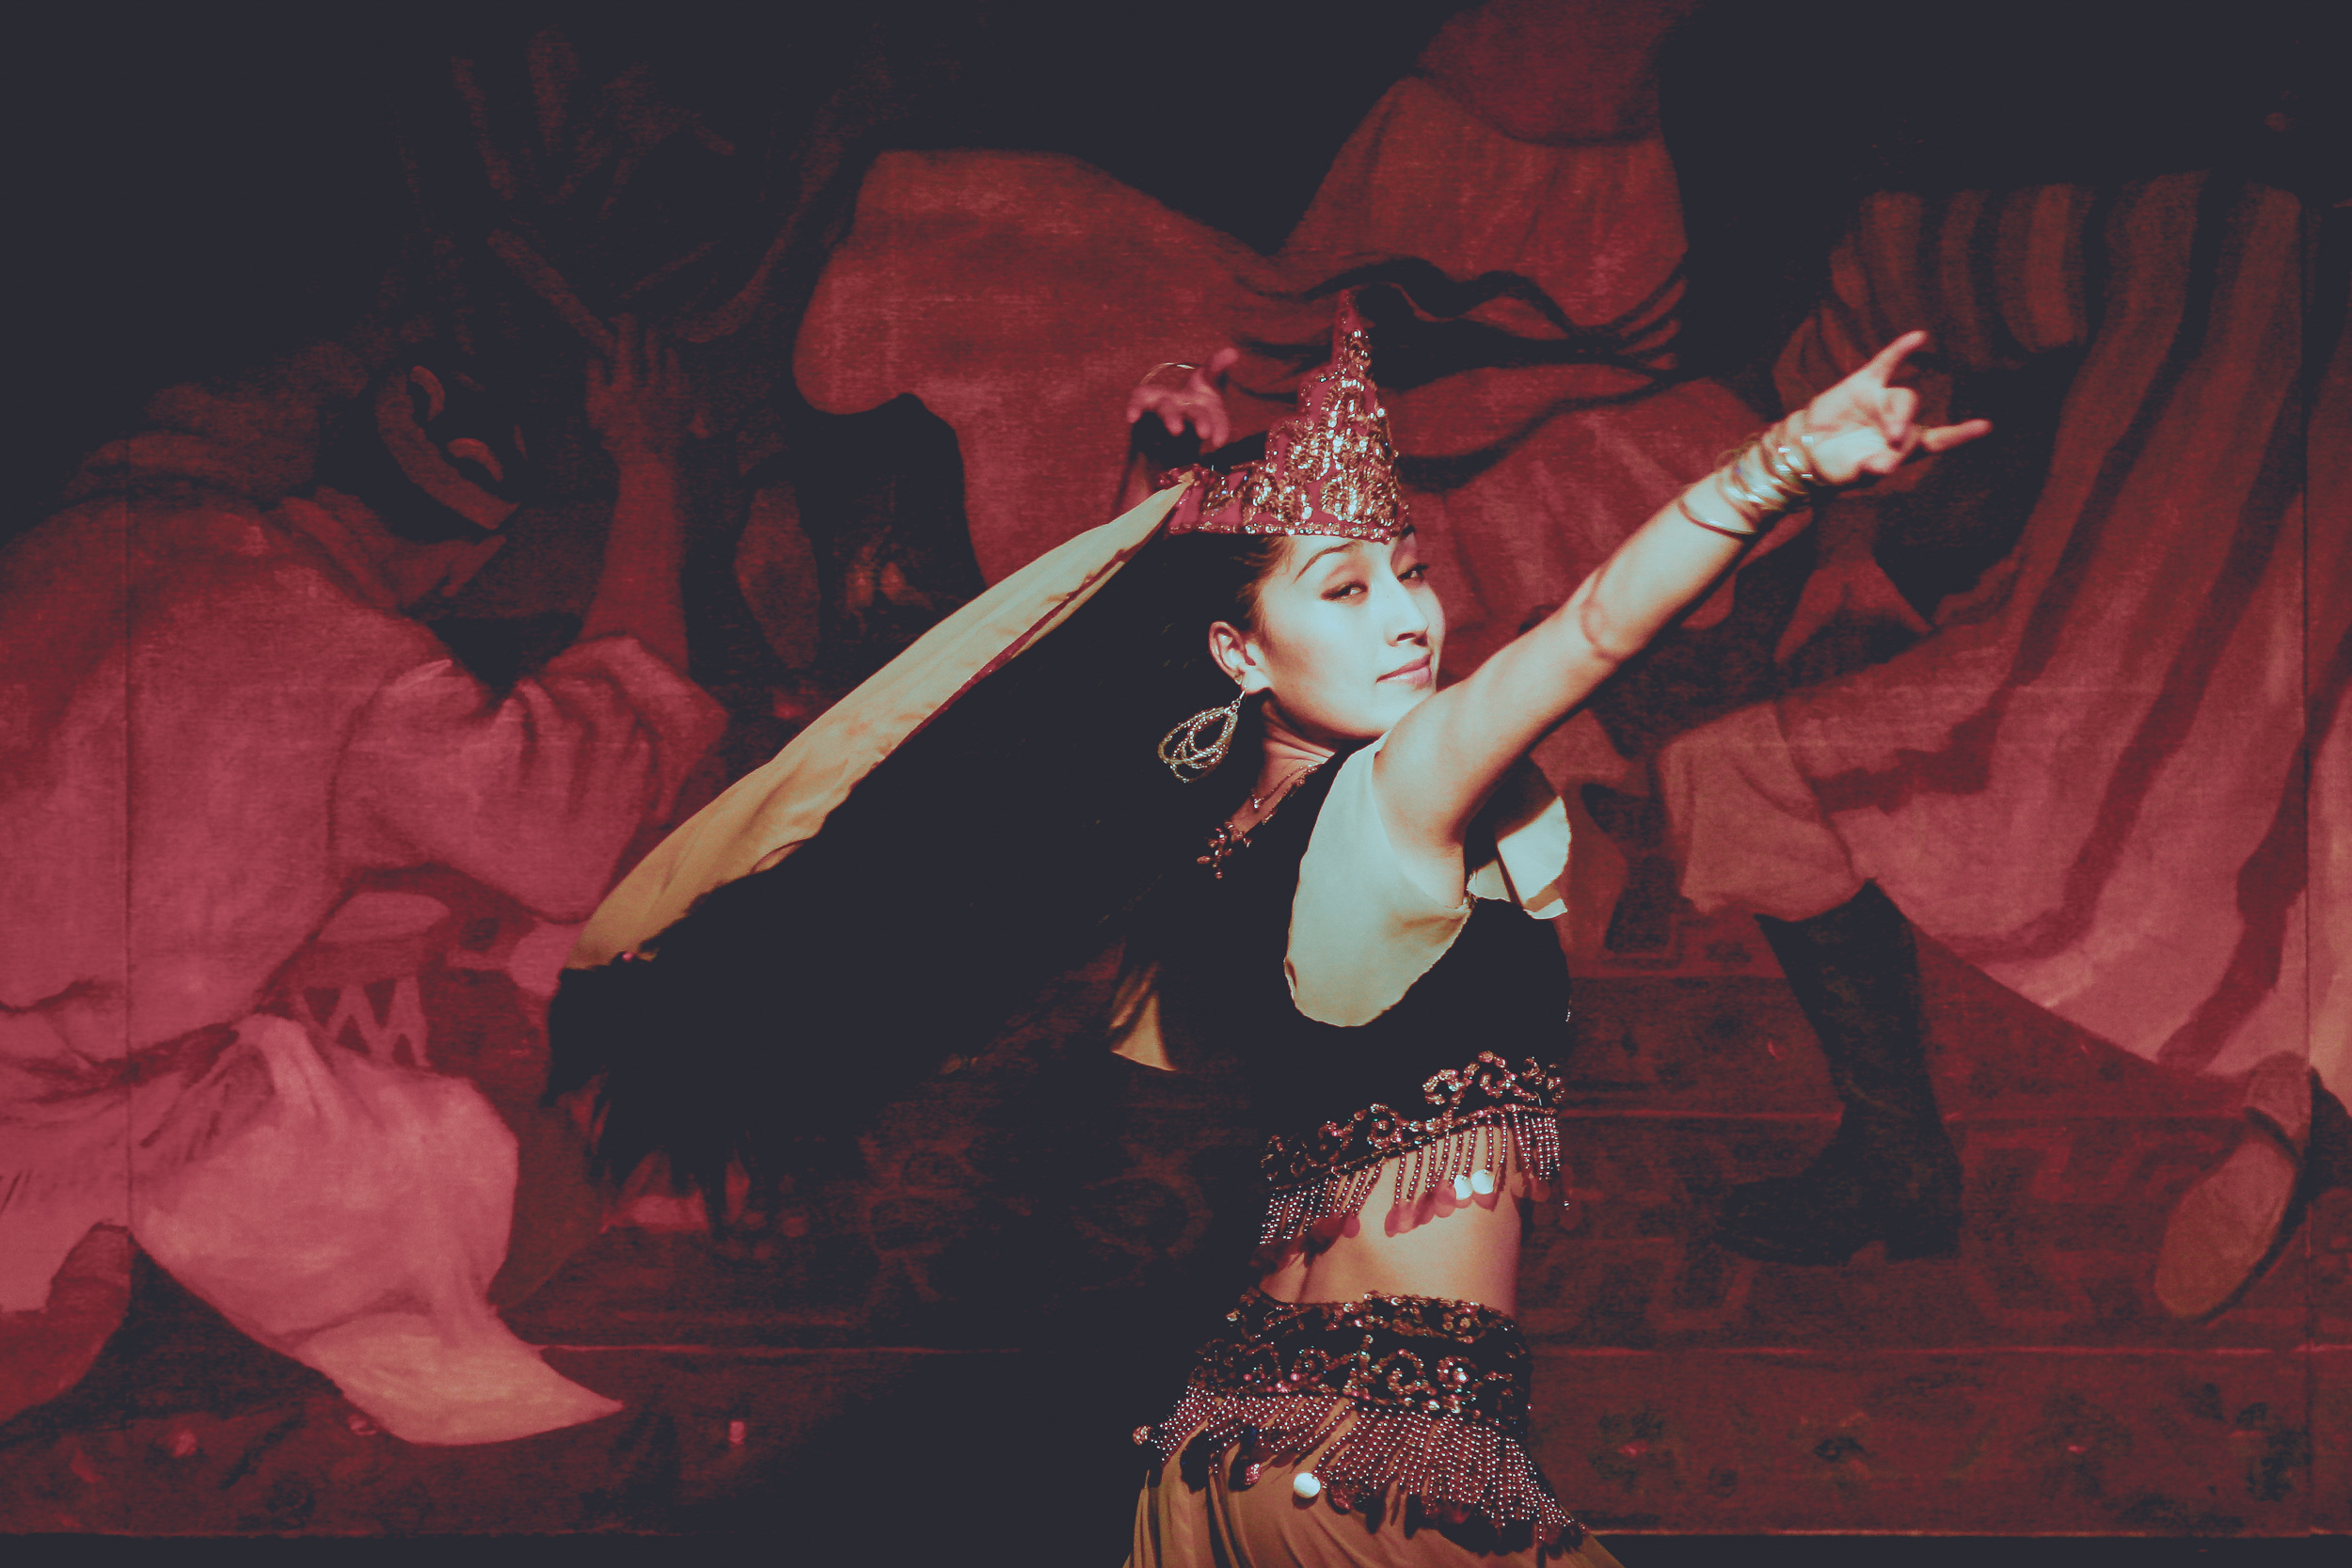 Xinjiang folk dancer at Red Rose Restaurant in Beijing